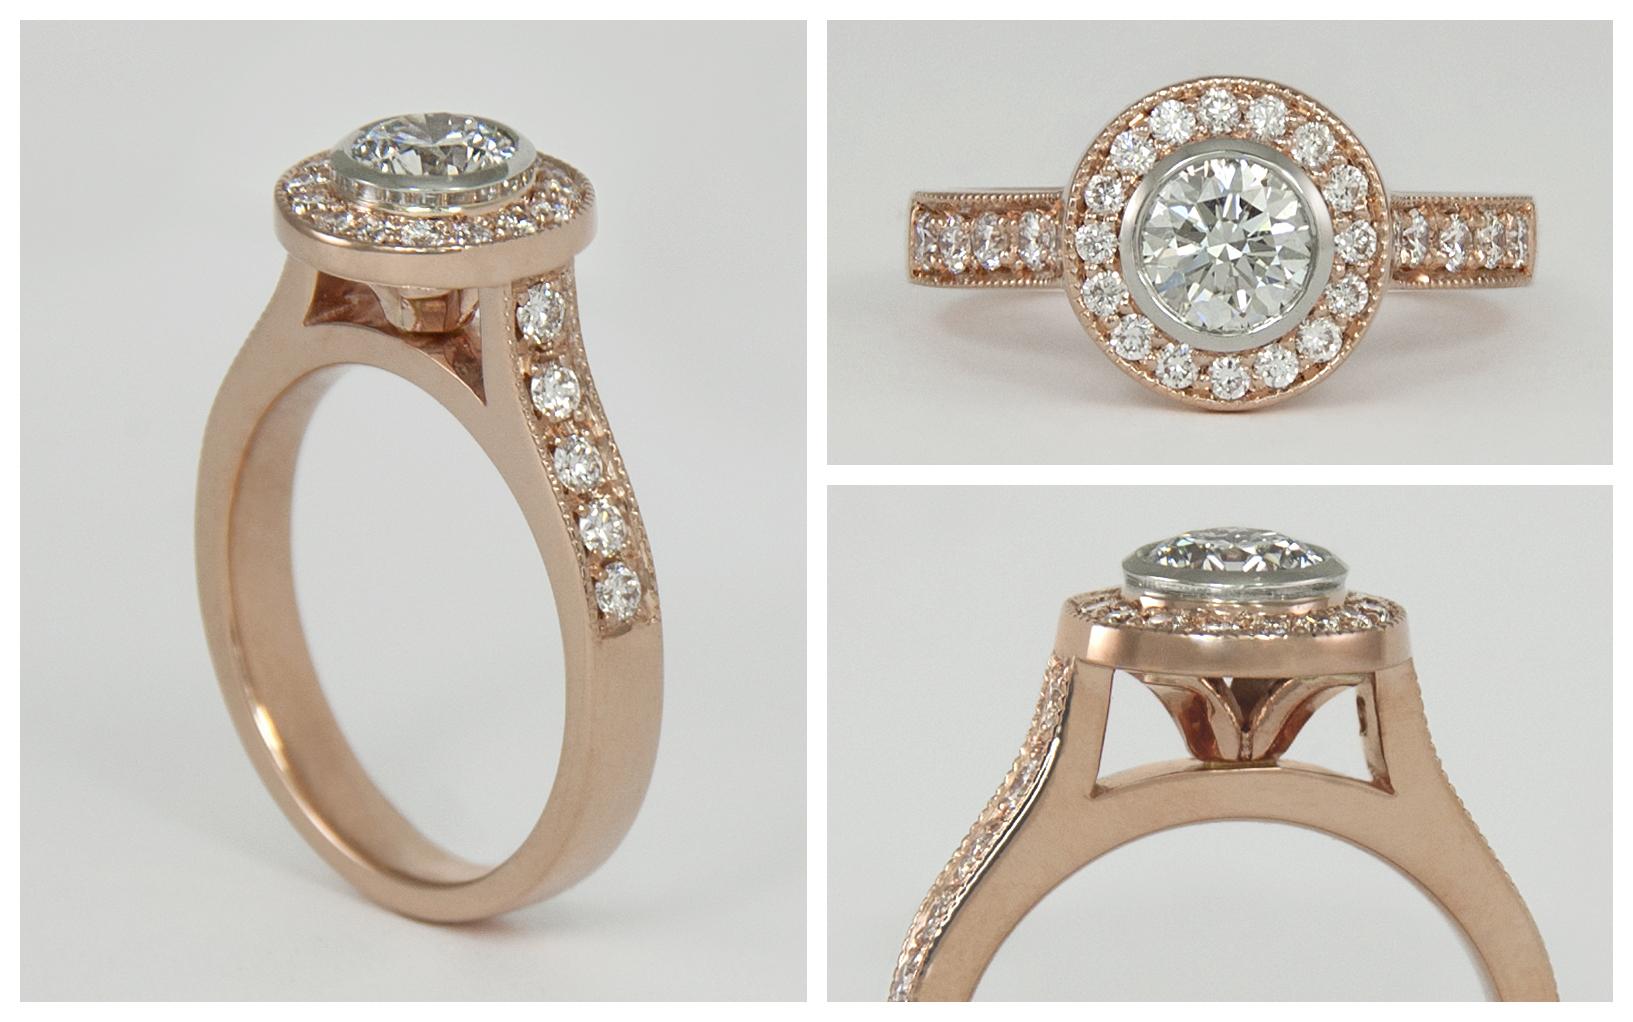 14KR Diamond Halo Ring with 14KW Bezel